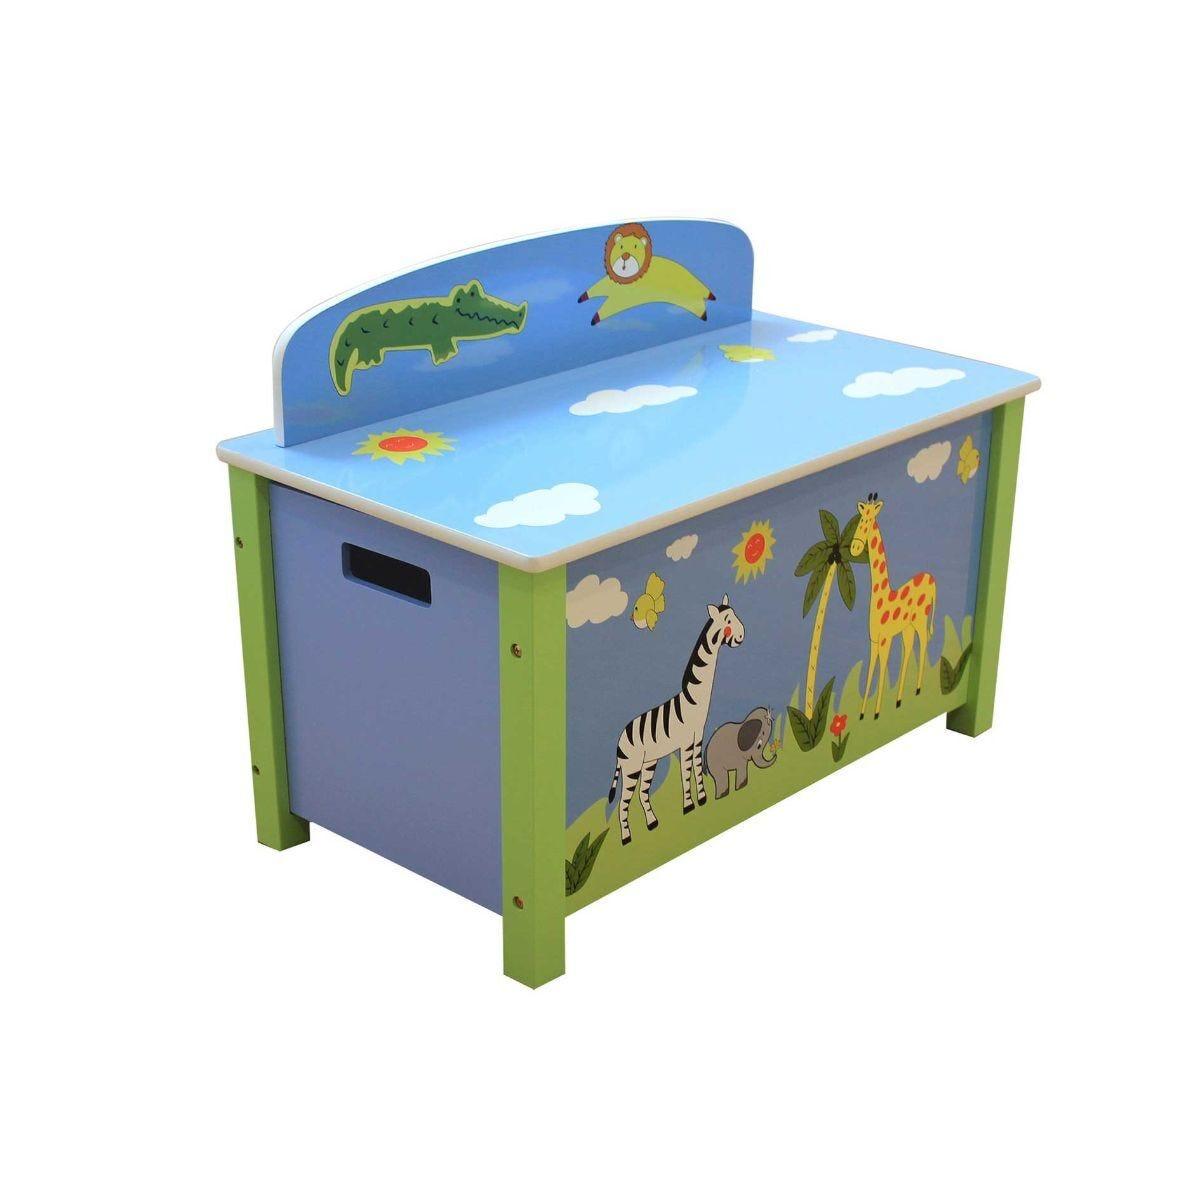 Childrens Wild Safari Wooden Toy Box Large